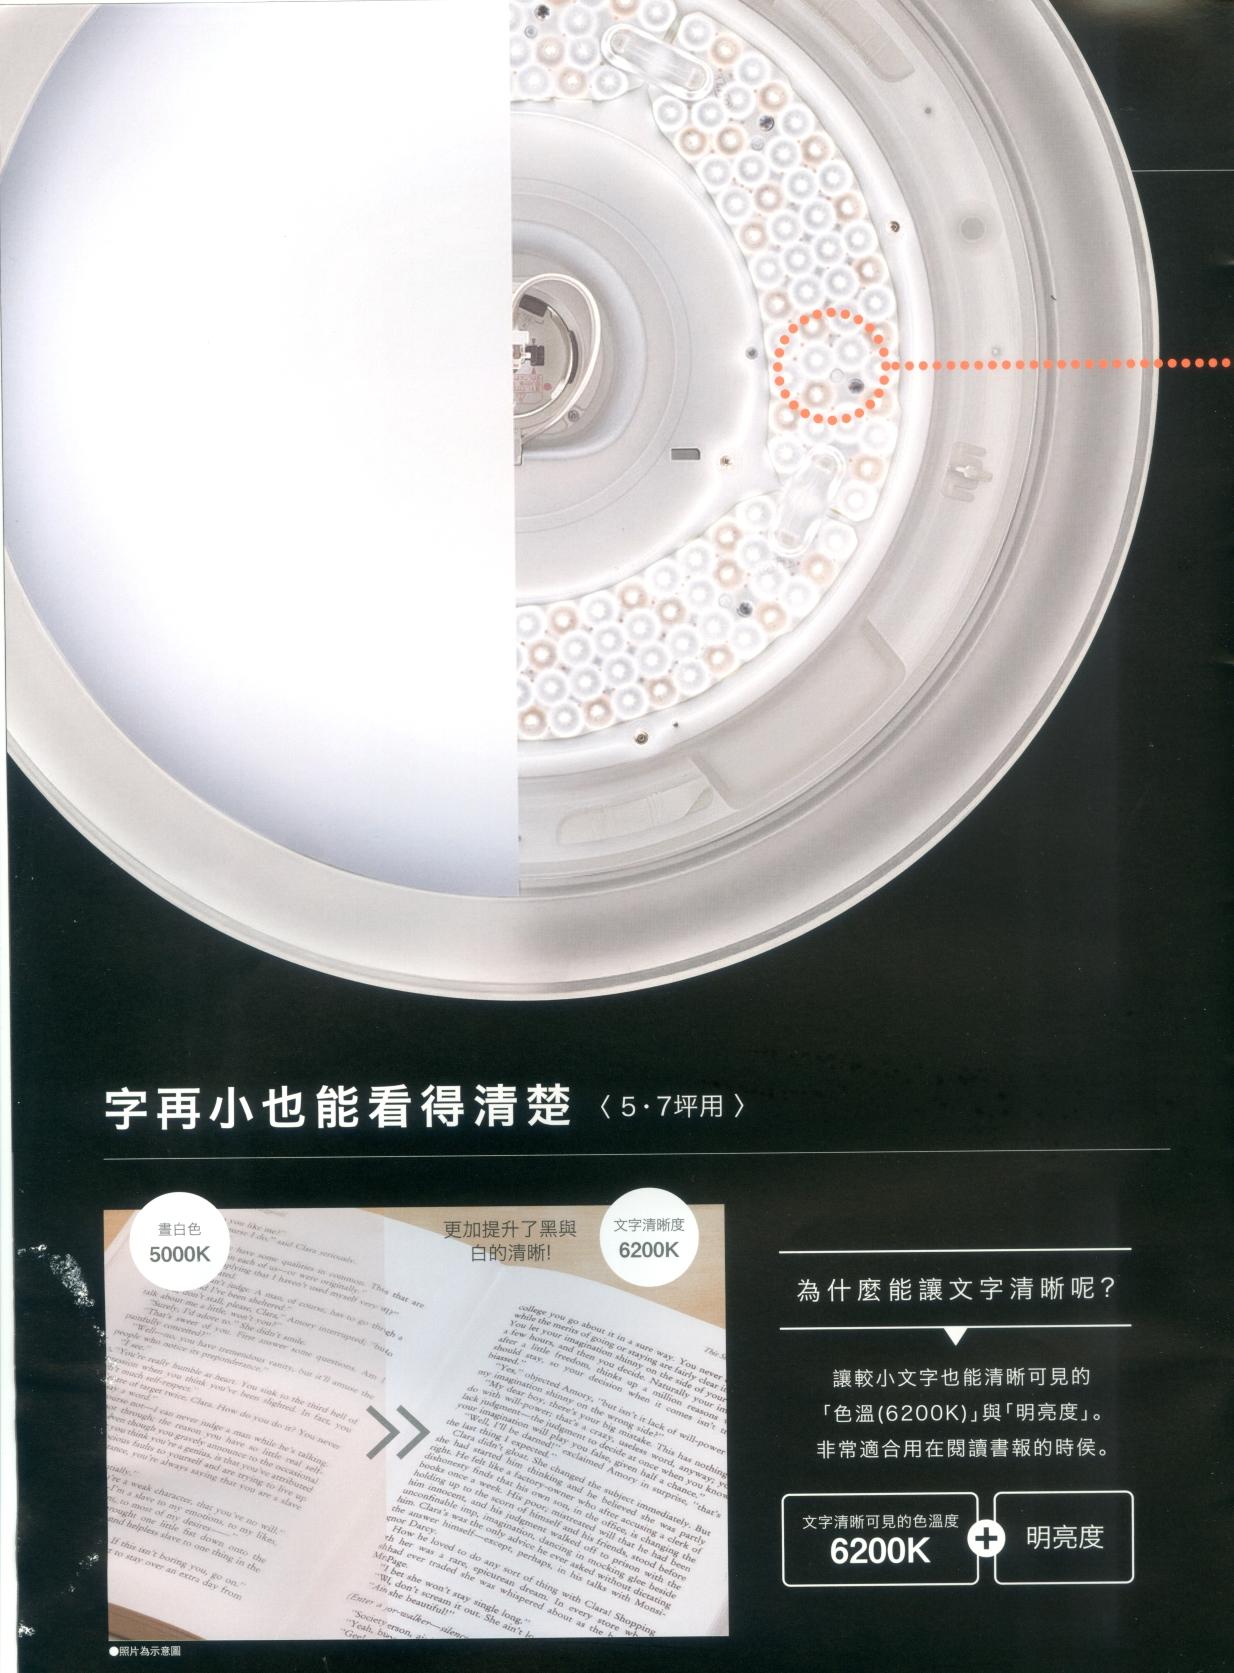 Panasonic吸頂燈1.jpg